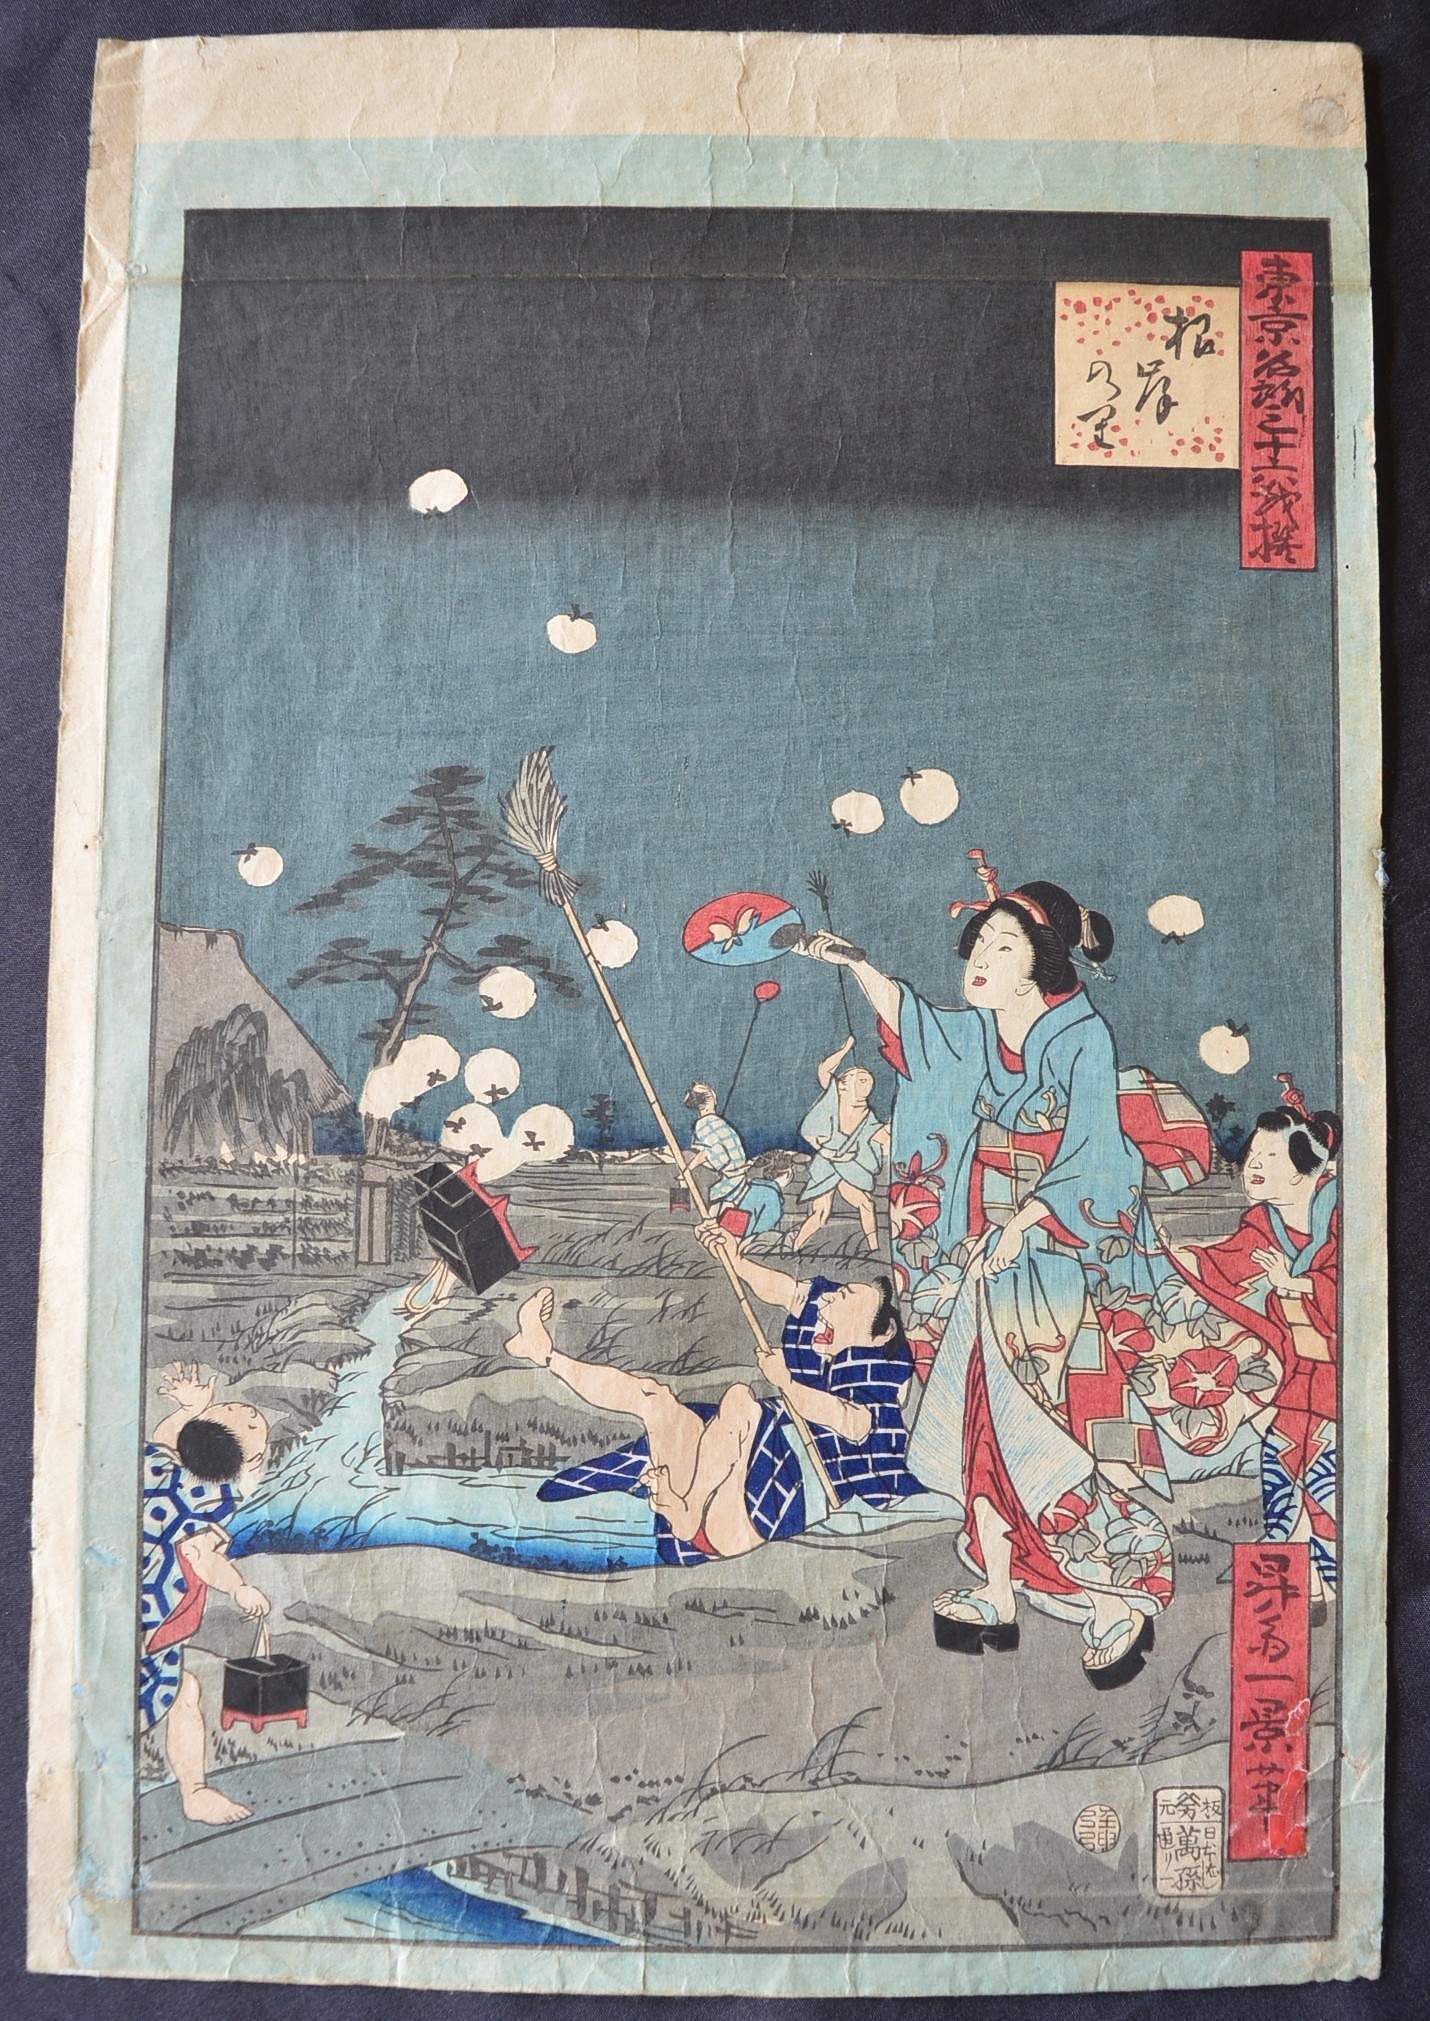 IKKEI SHOSAI: #P4485 CATCHING FIREFLIES ON A SUMMER'S NIGHT (1872-1875)